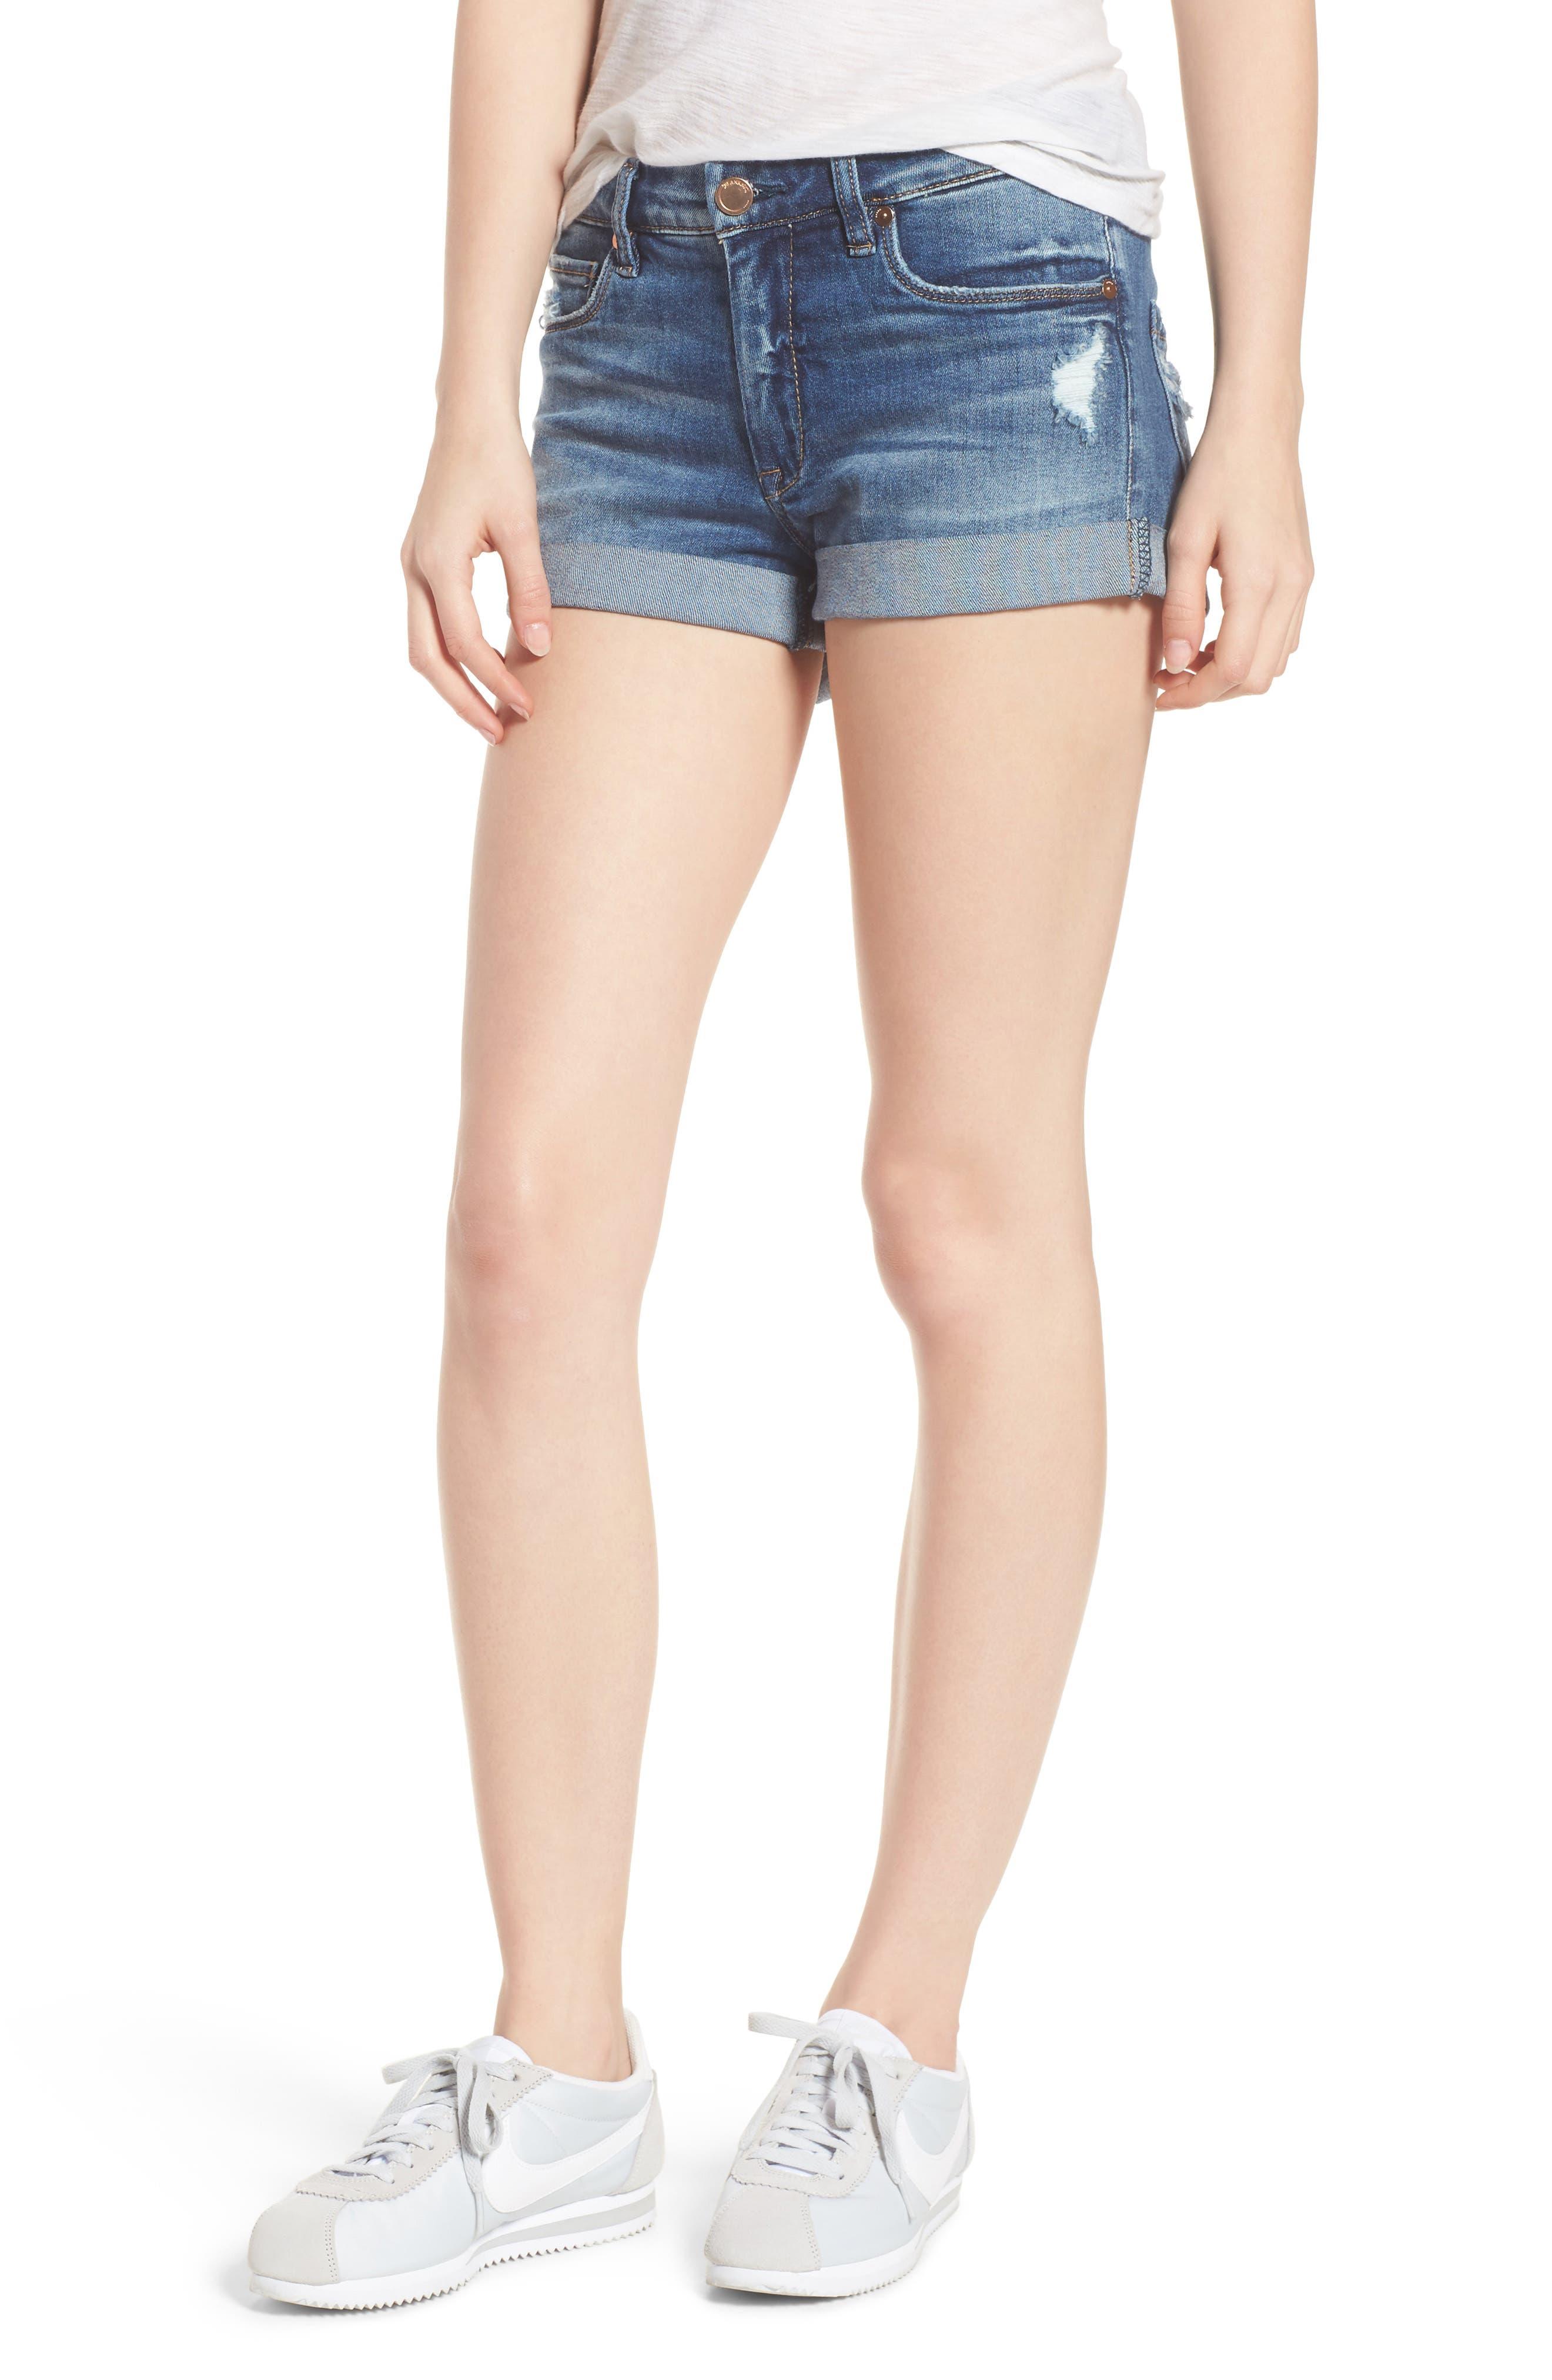 Plalay Hard Cuffed Jean Shorts,                             Main thumbnail 1, color,                             Blue